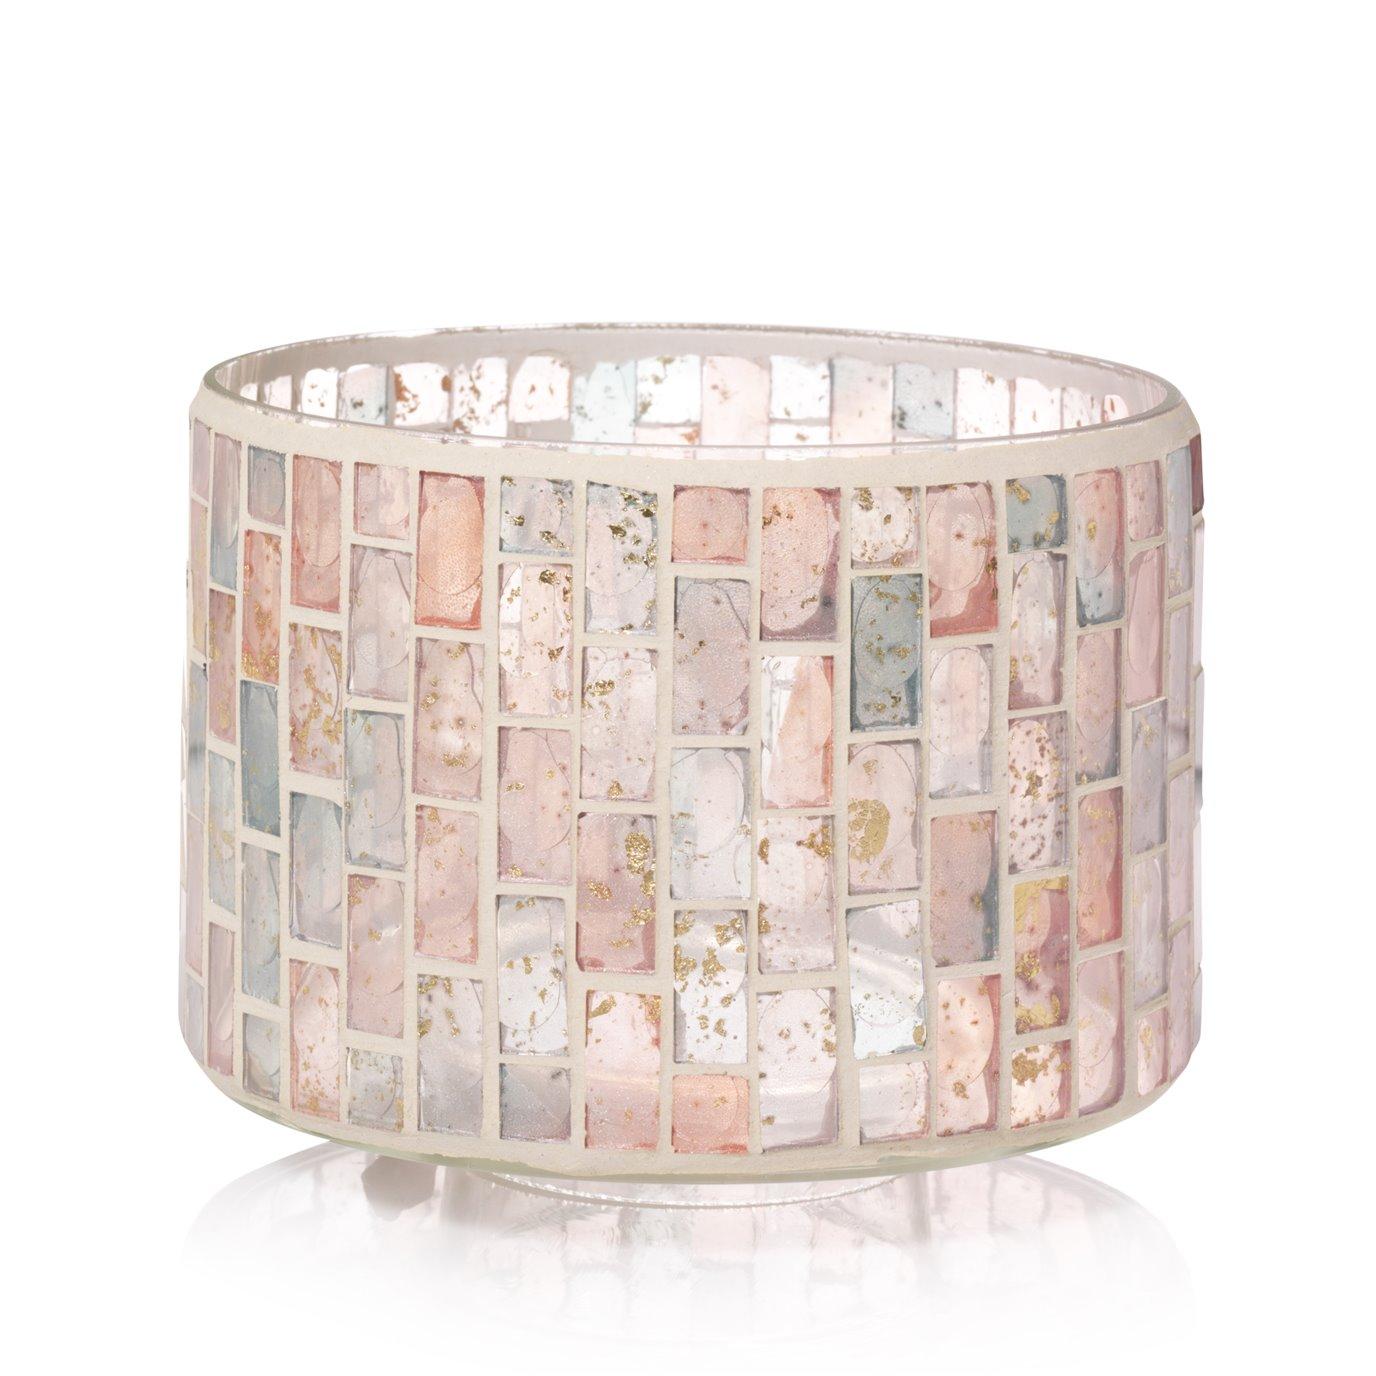 Yankee Candle Romance Mosaic Barrel Shaped Jar Shade